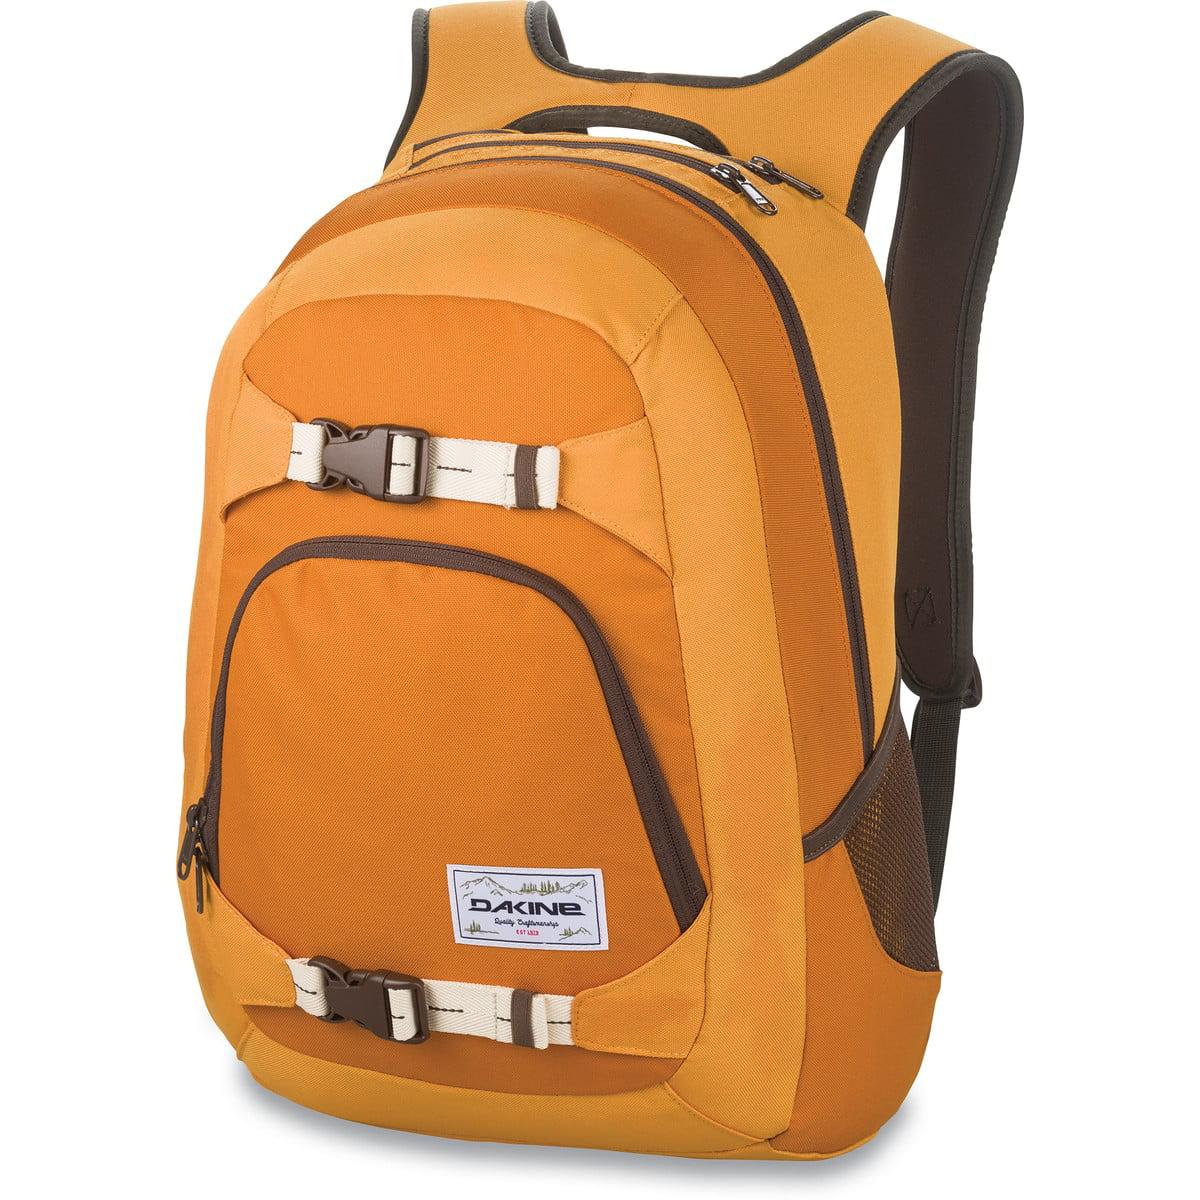 9a888addb7040 Dakine Explorer 26L Backpack - Walmart.com